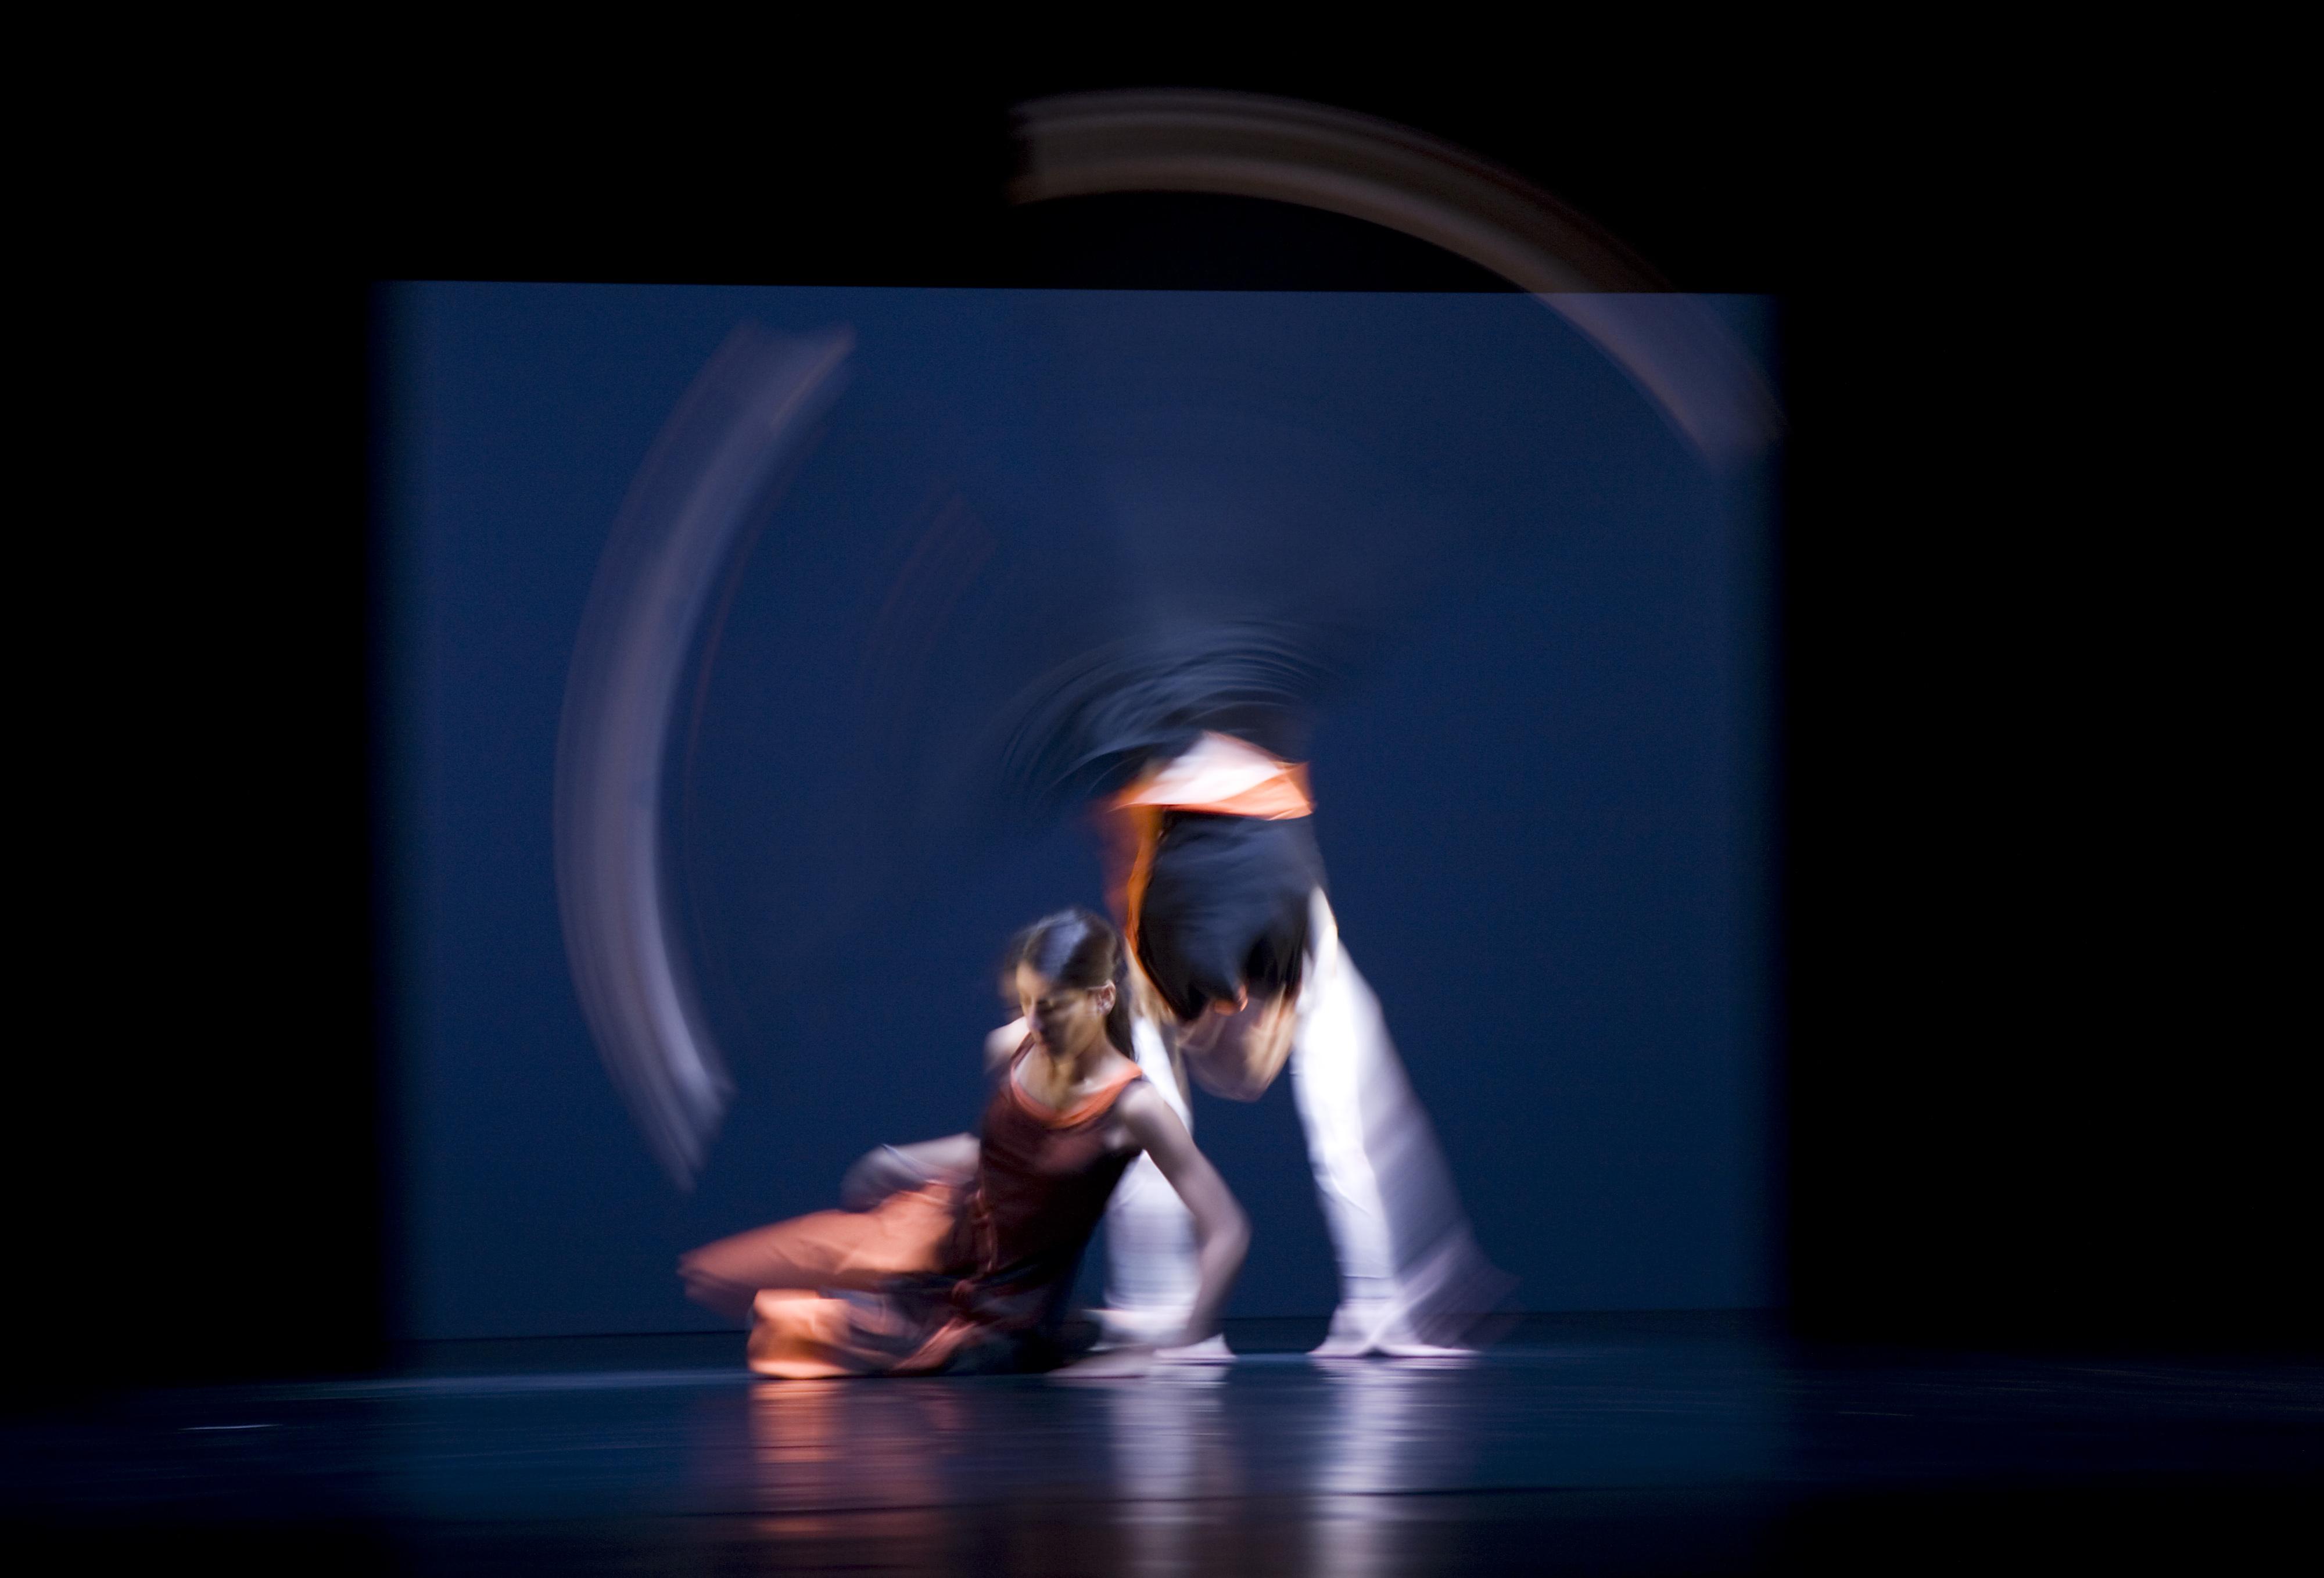 https://i0.wp.com/upload.wikimedia.org/wikipedia/commons/e/e5/Munich_-_Two_dancers_captured_in_blurred_movement_-_7800.jpg